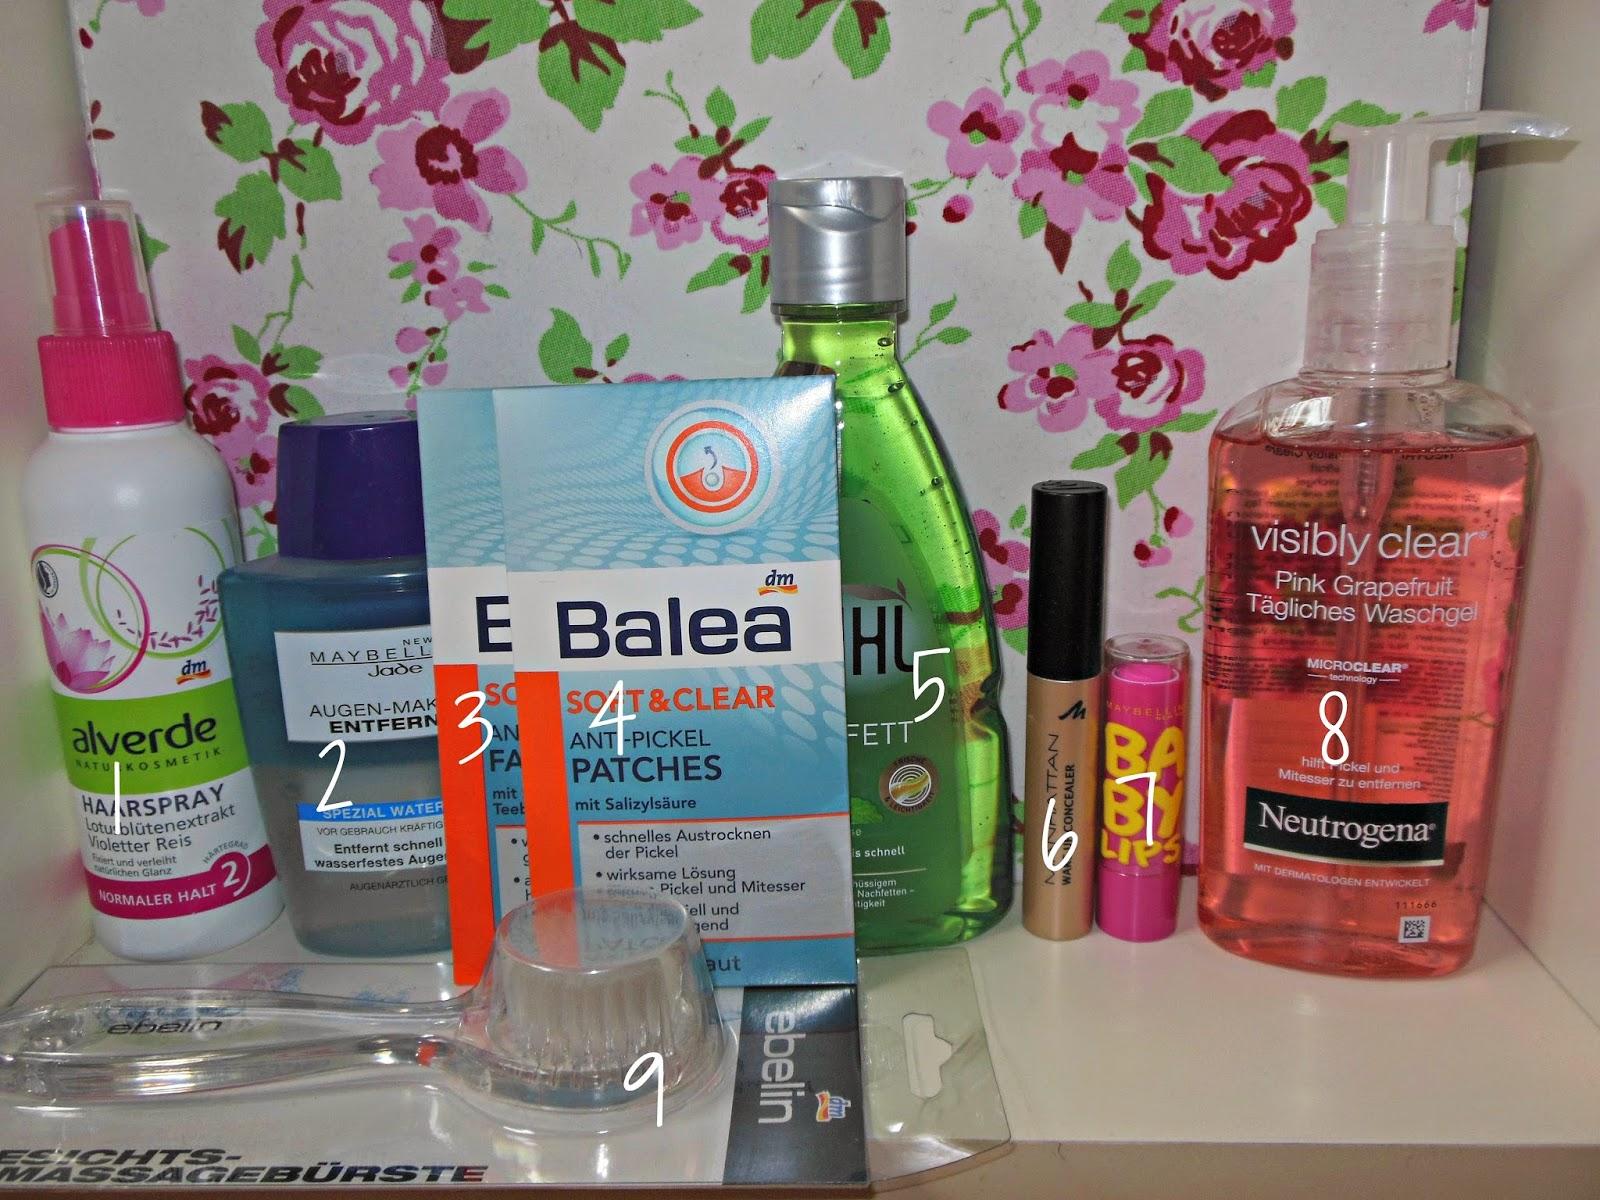 DM Haul (New In #40) | Nourishing shampoo, Sensitive